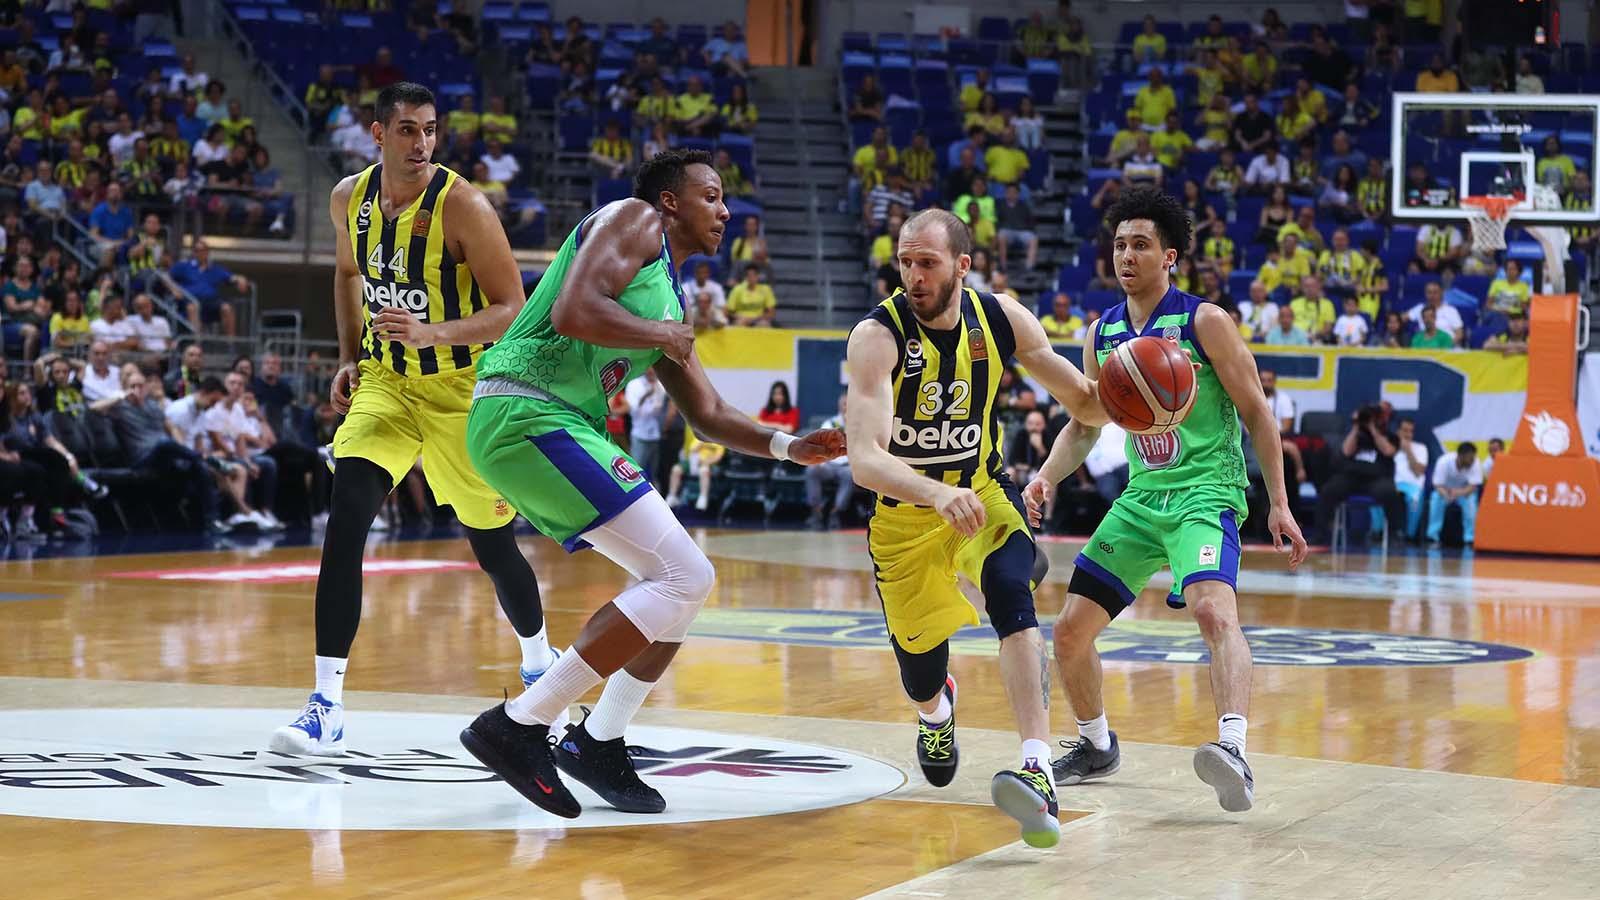 Play-off yarı final serisi Bursa'ya taşınıyor